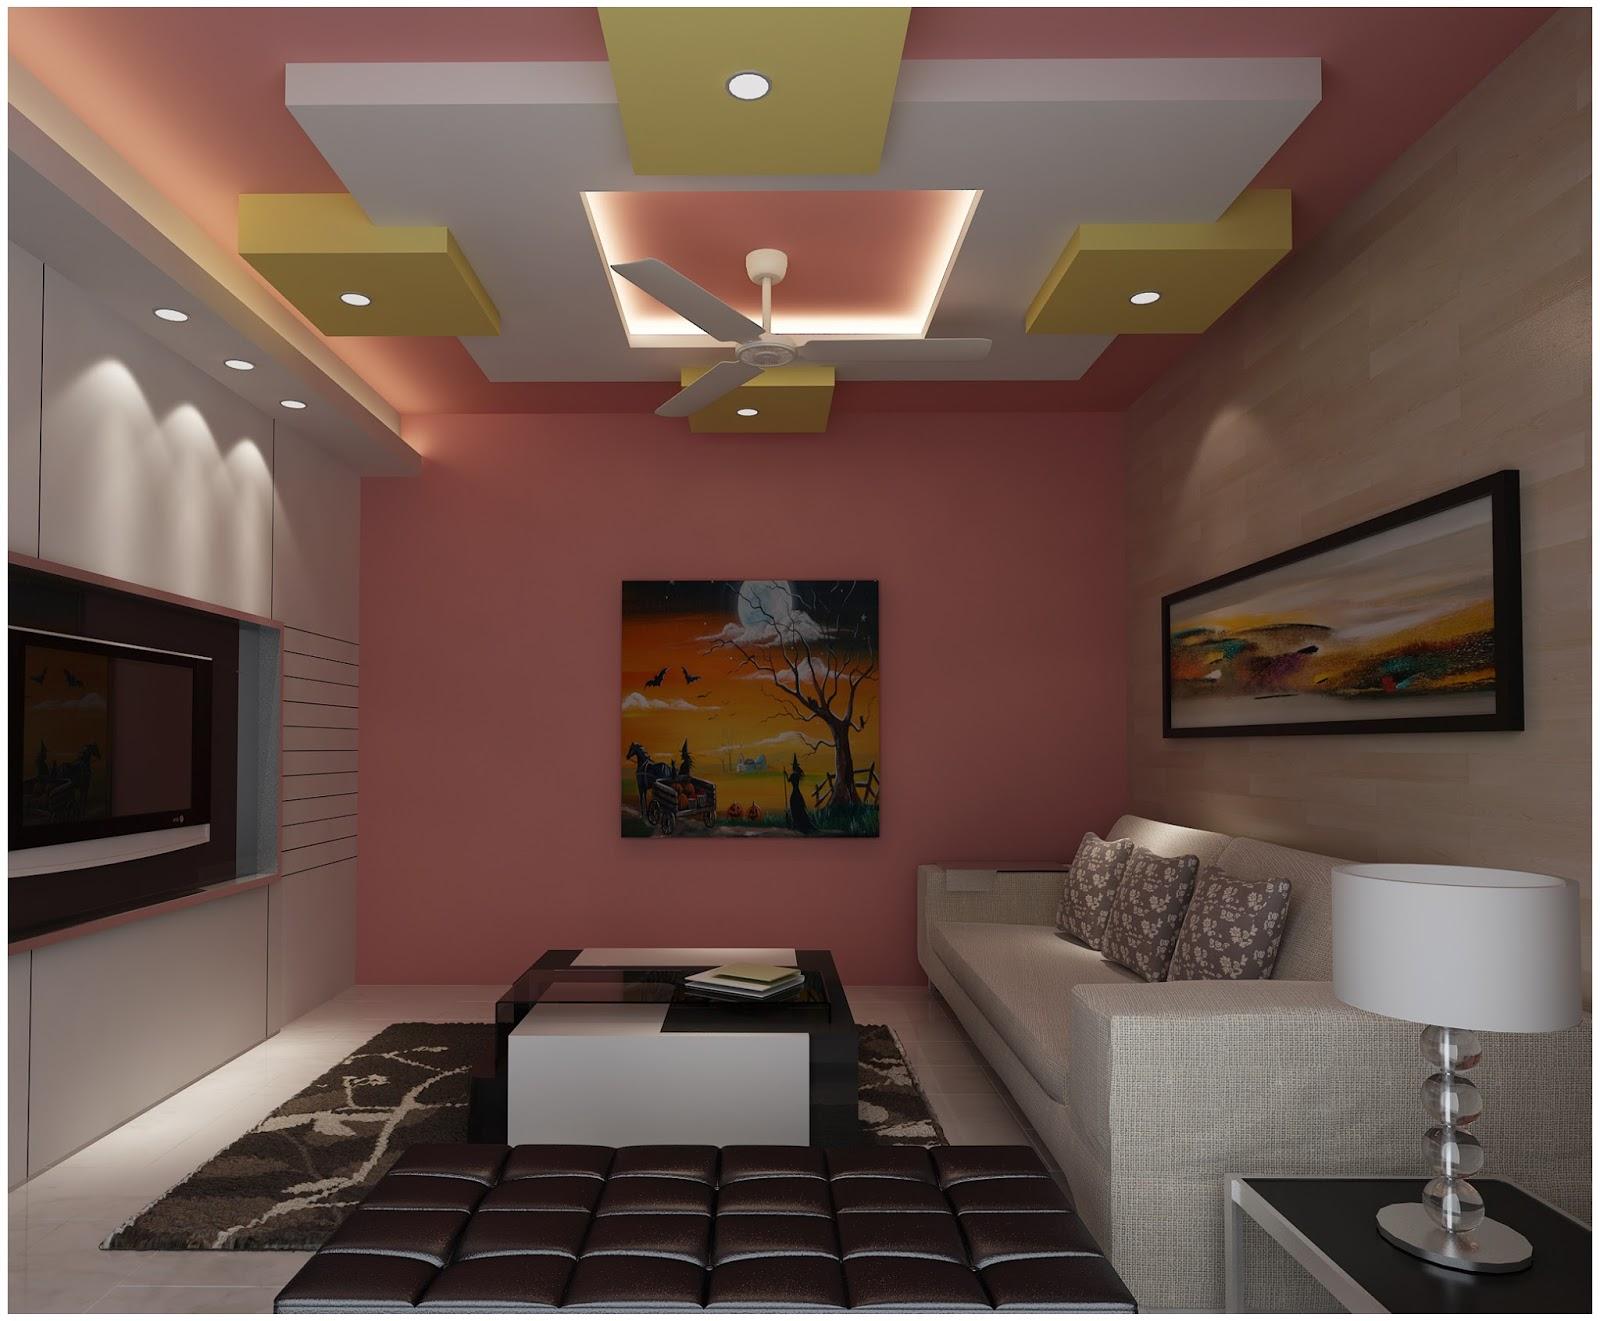 Pop ceiling designs for hall joy studio design gallery for Pop design for hall photos